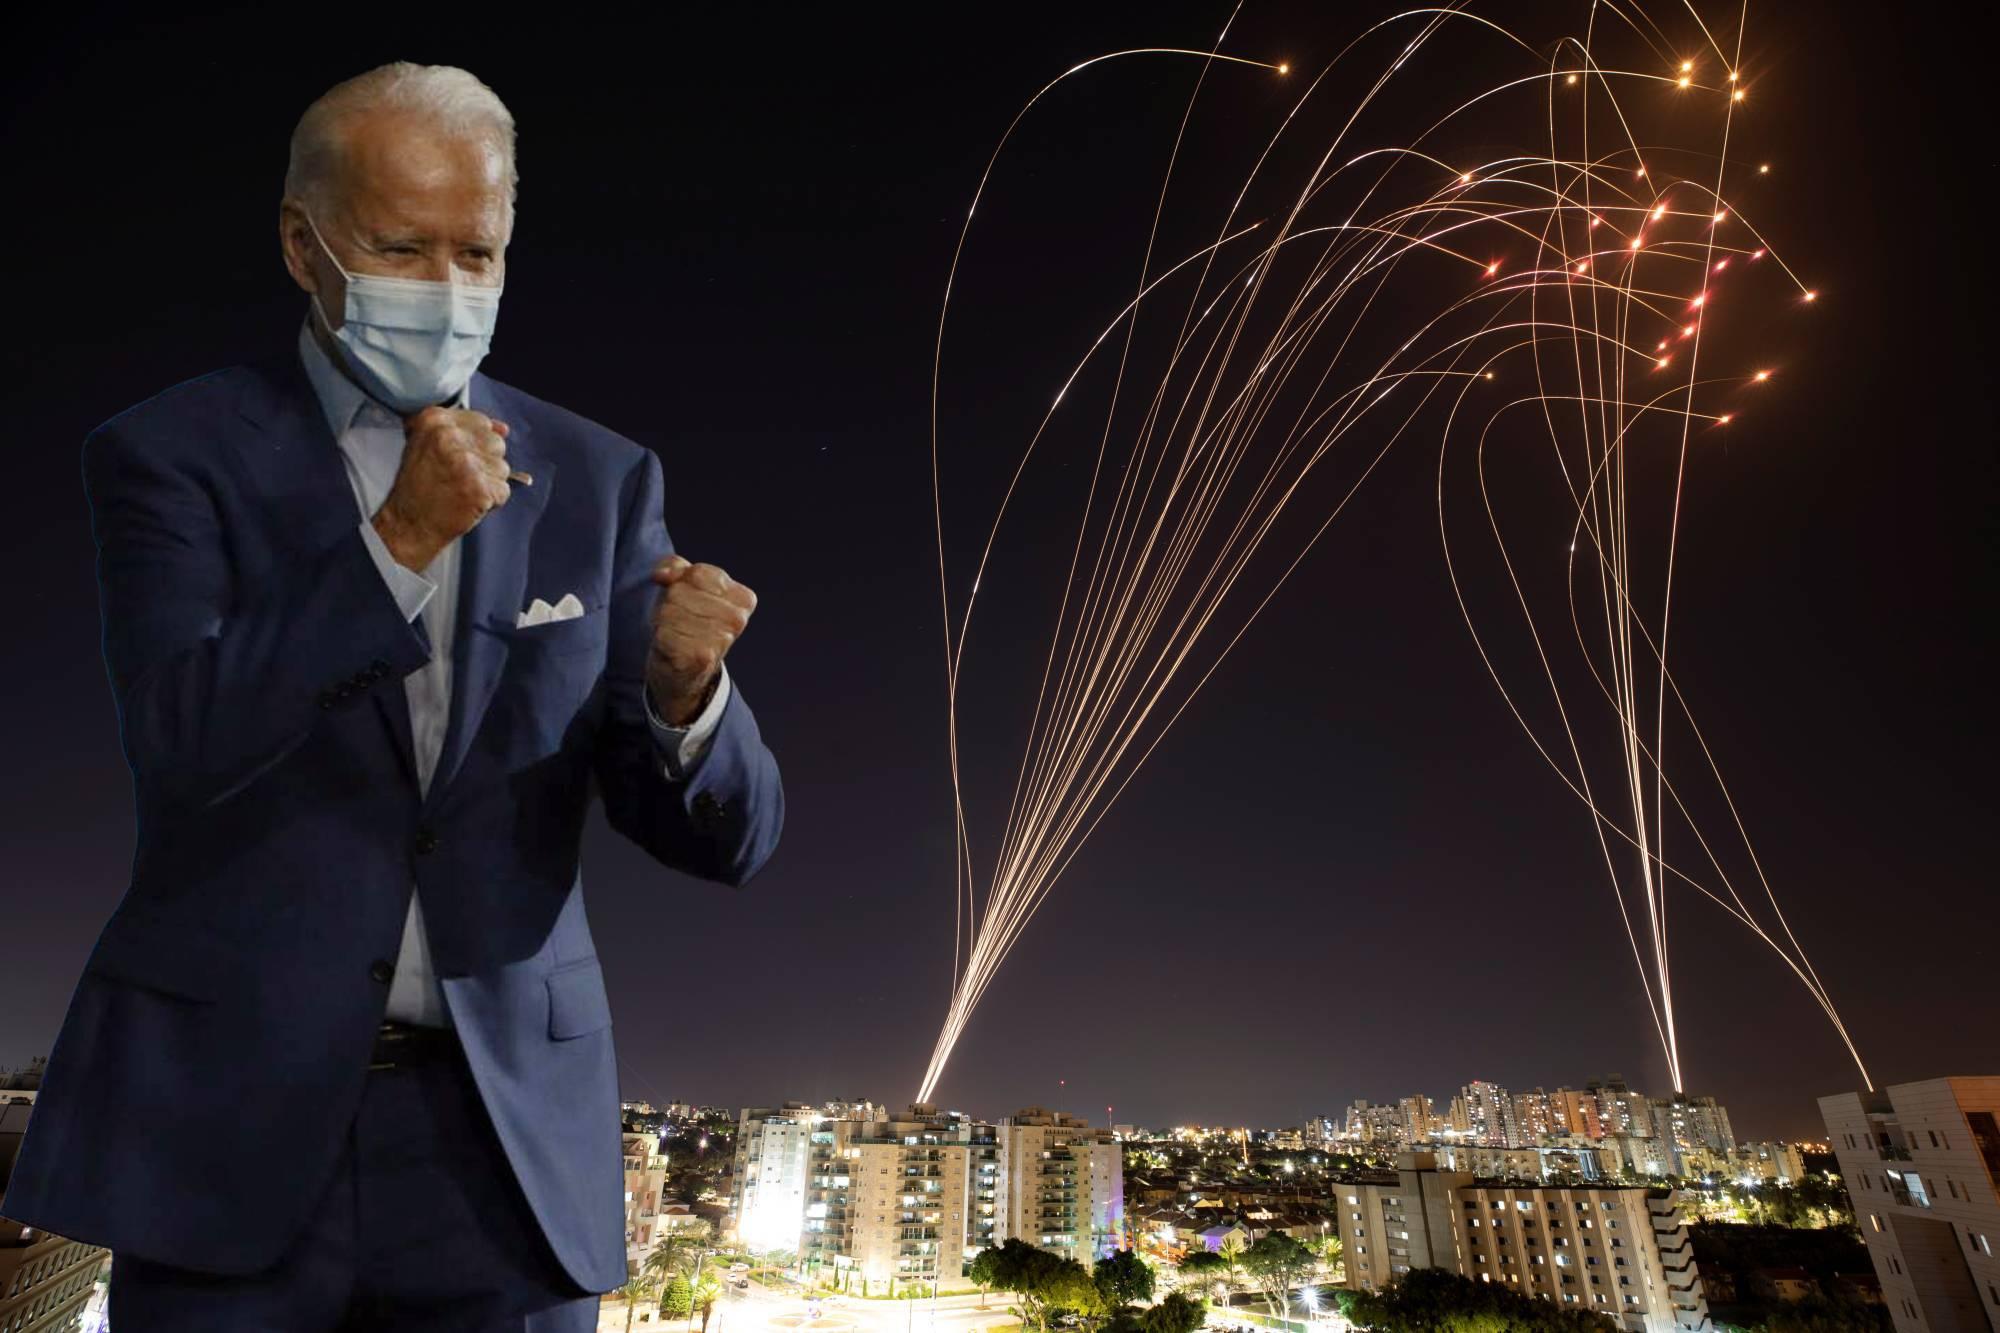 Políticas de Biden han conducido a esta escalada terrorista contra Israel